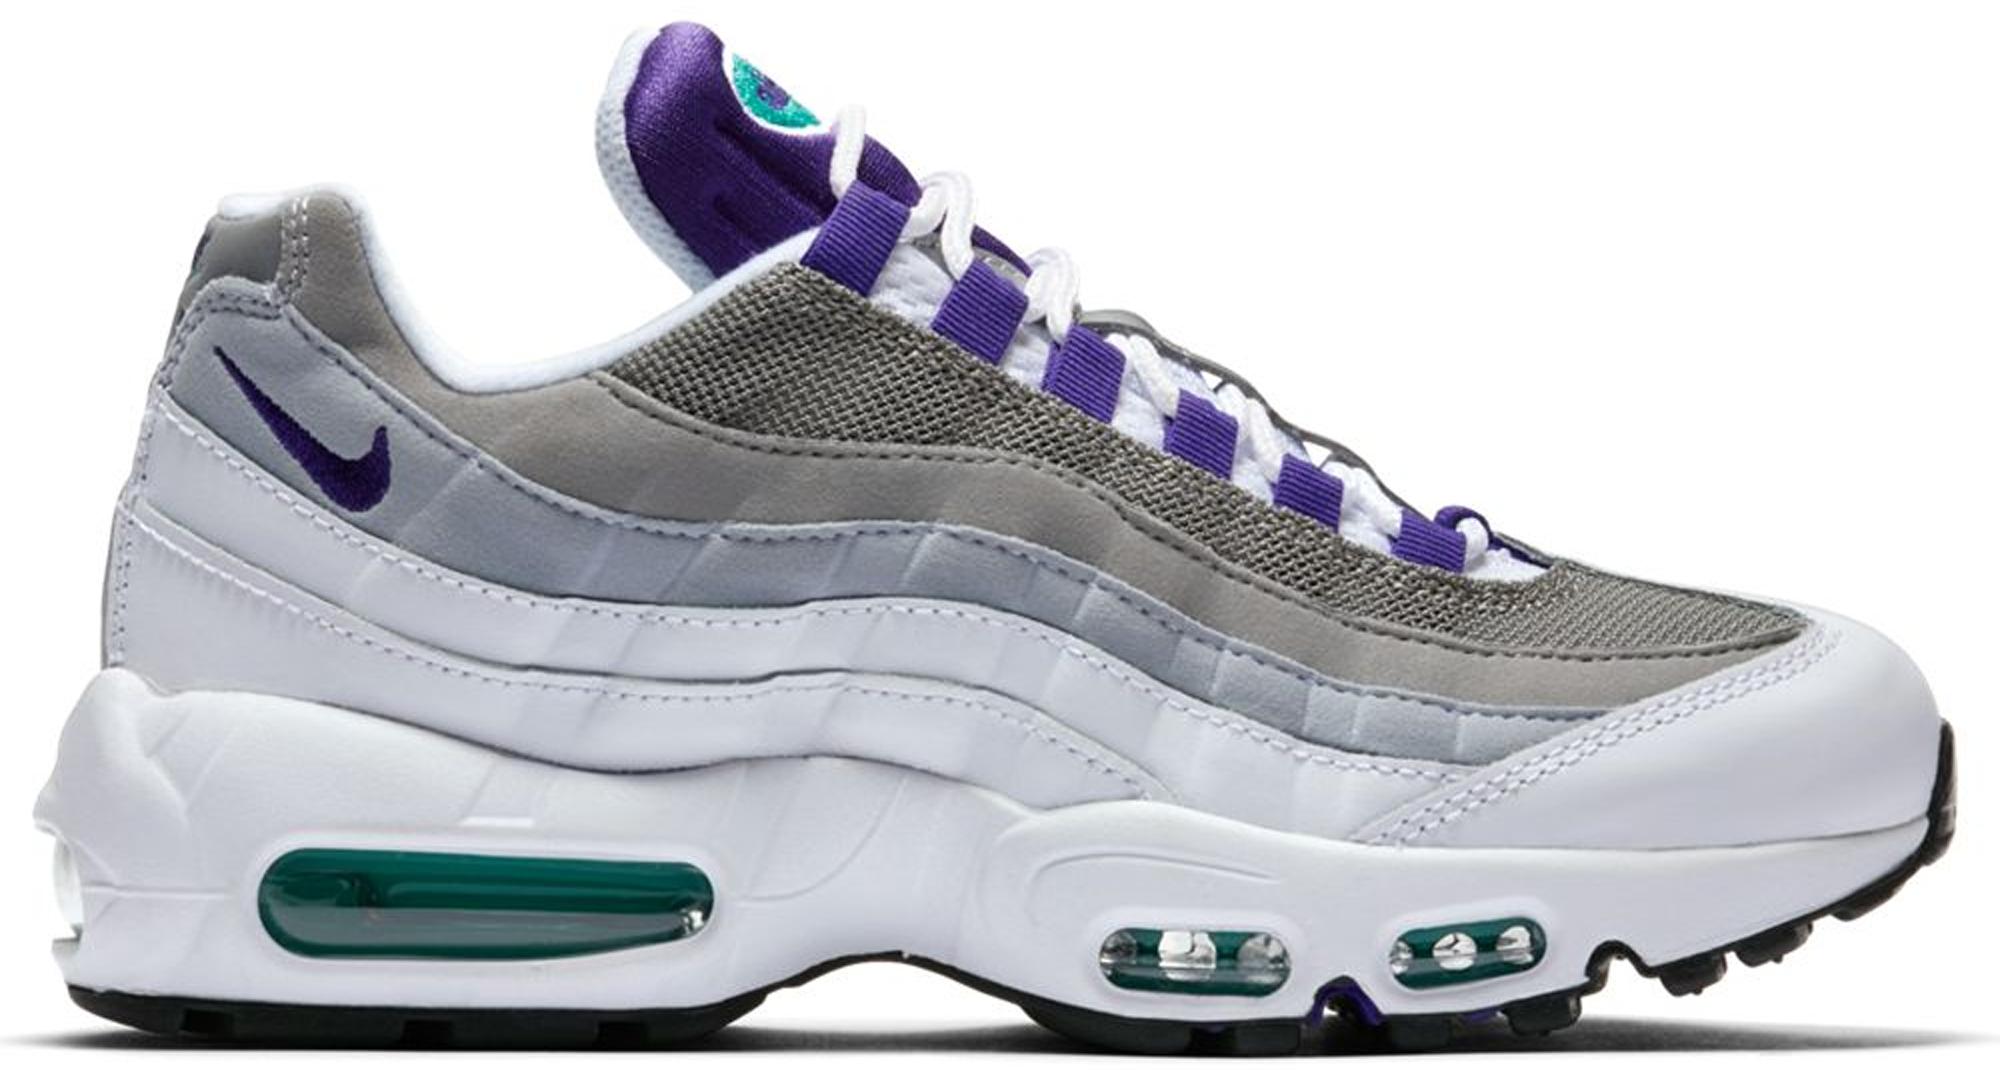 separation shoes 7490d 56ec8 ... switzerland air max 95 grape 2018 w 6e183 478b2